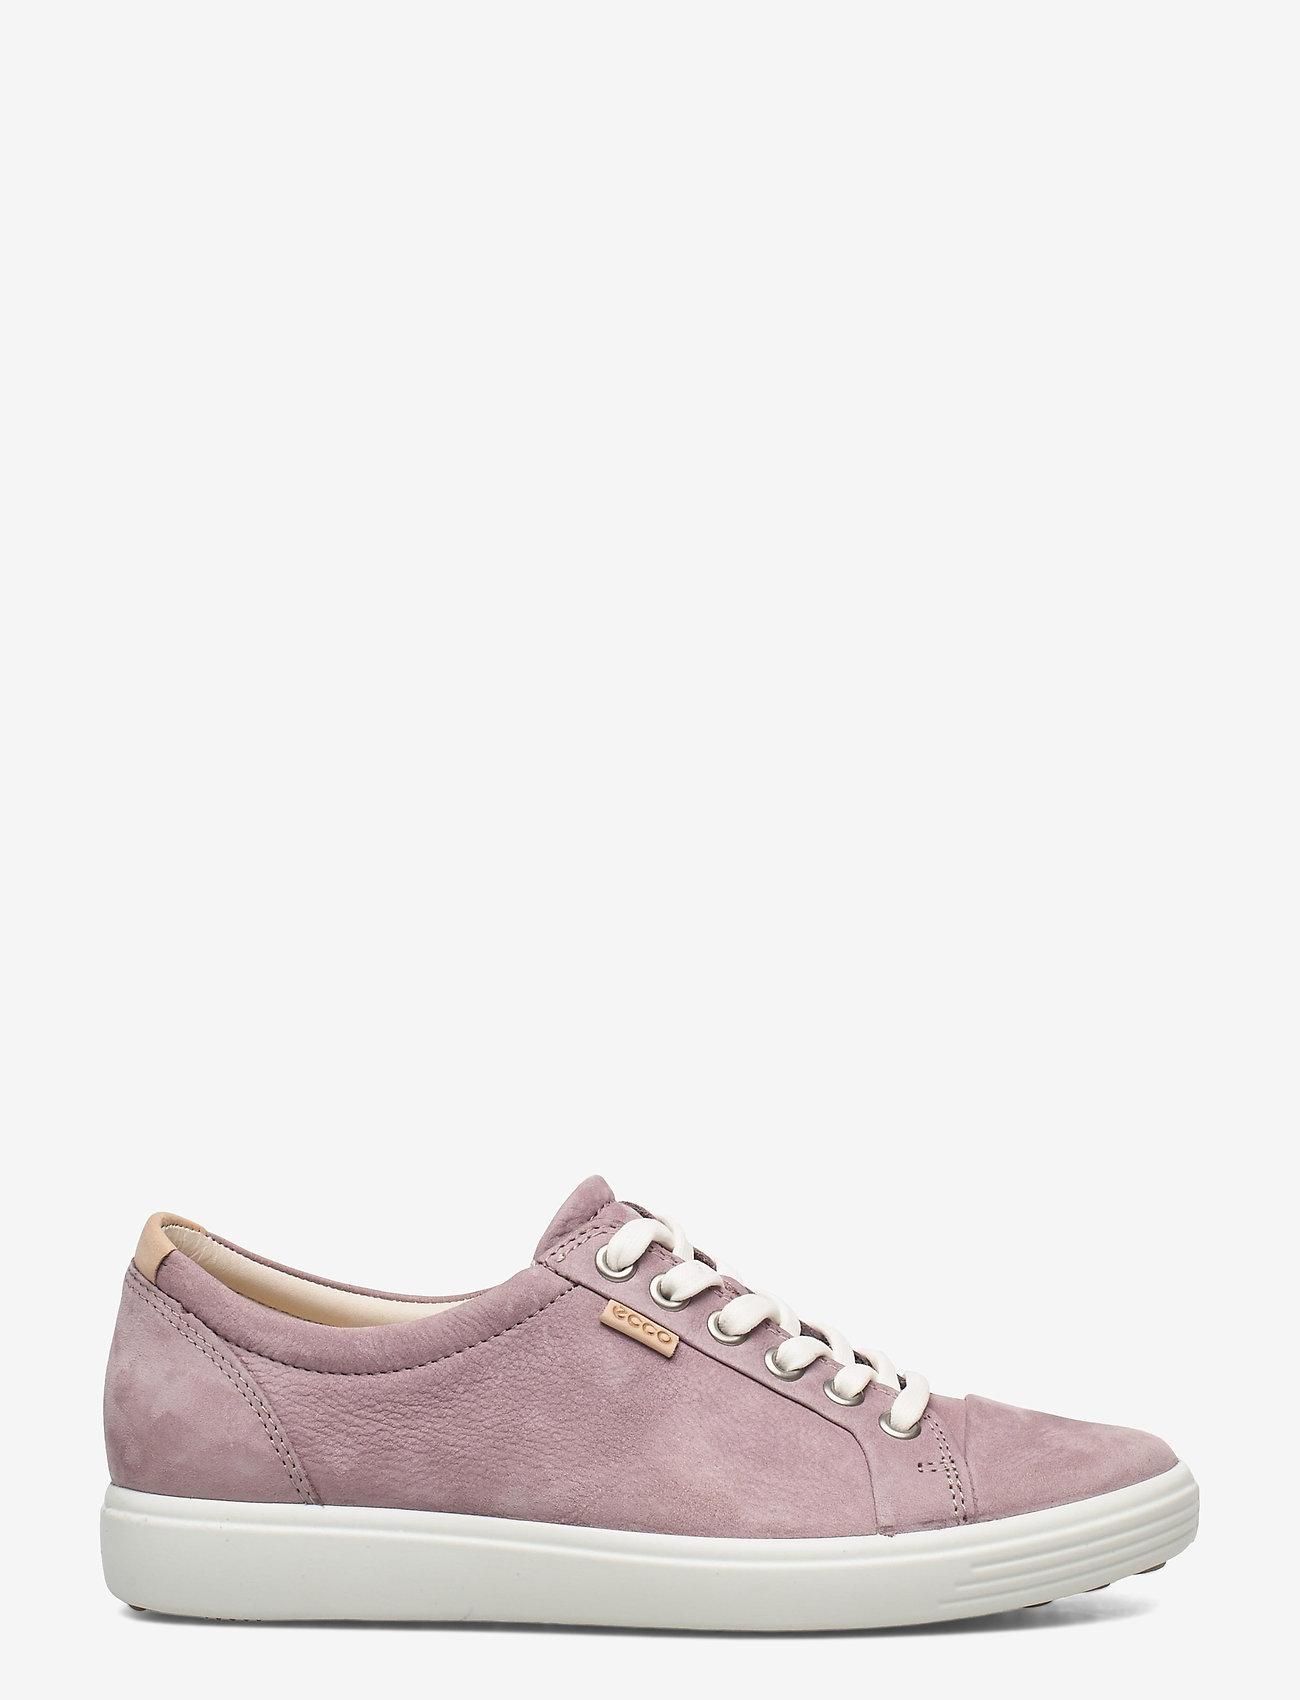 ECCO - SOFT 7 W - låga sneakers - woodrose - 1